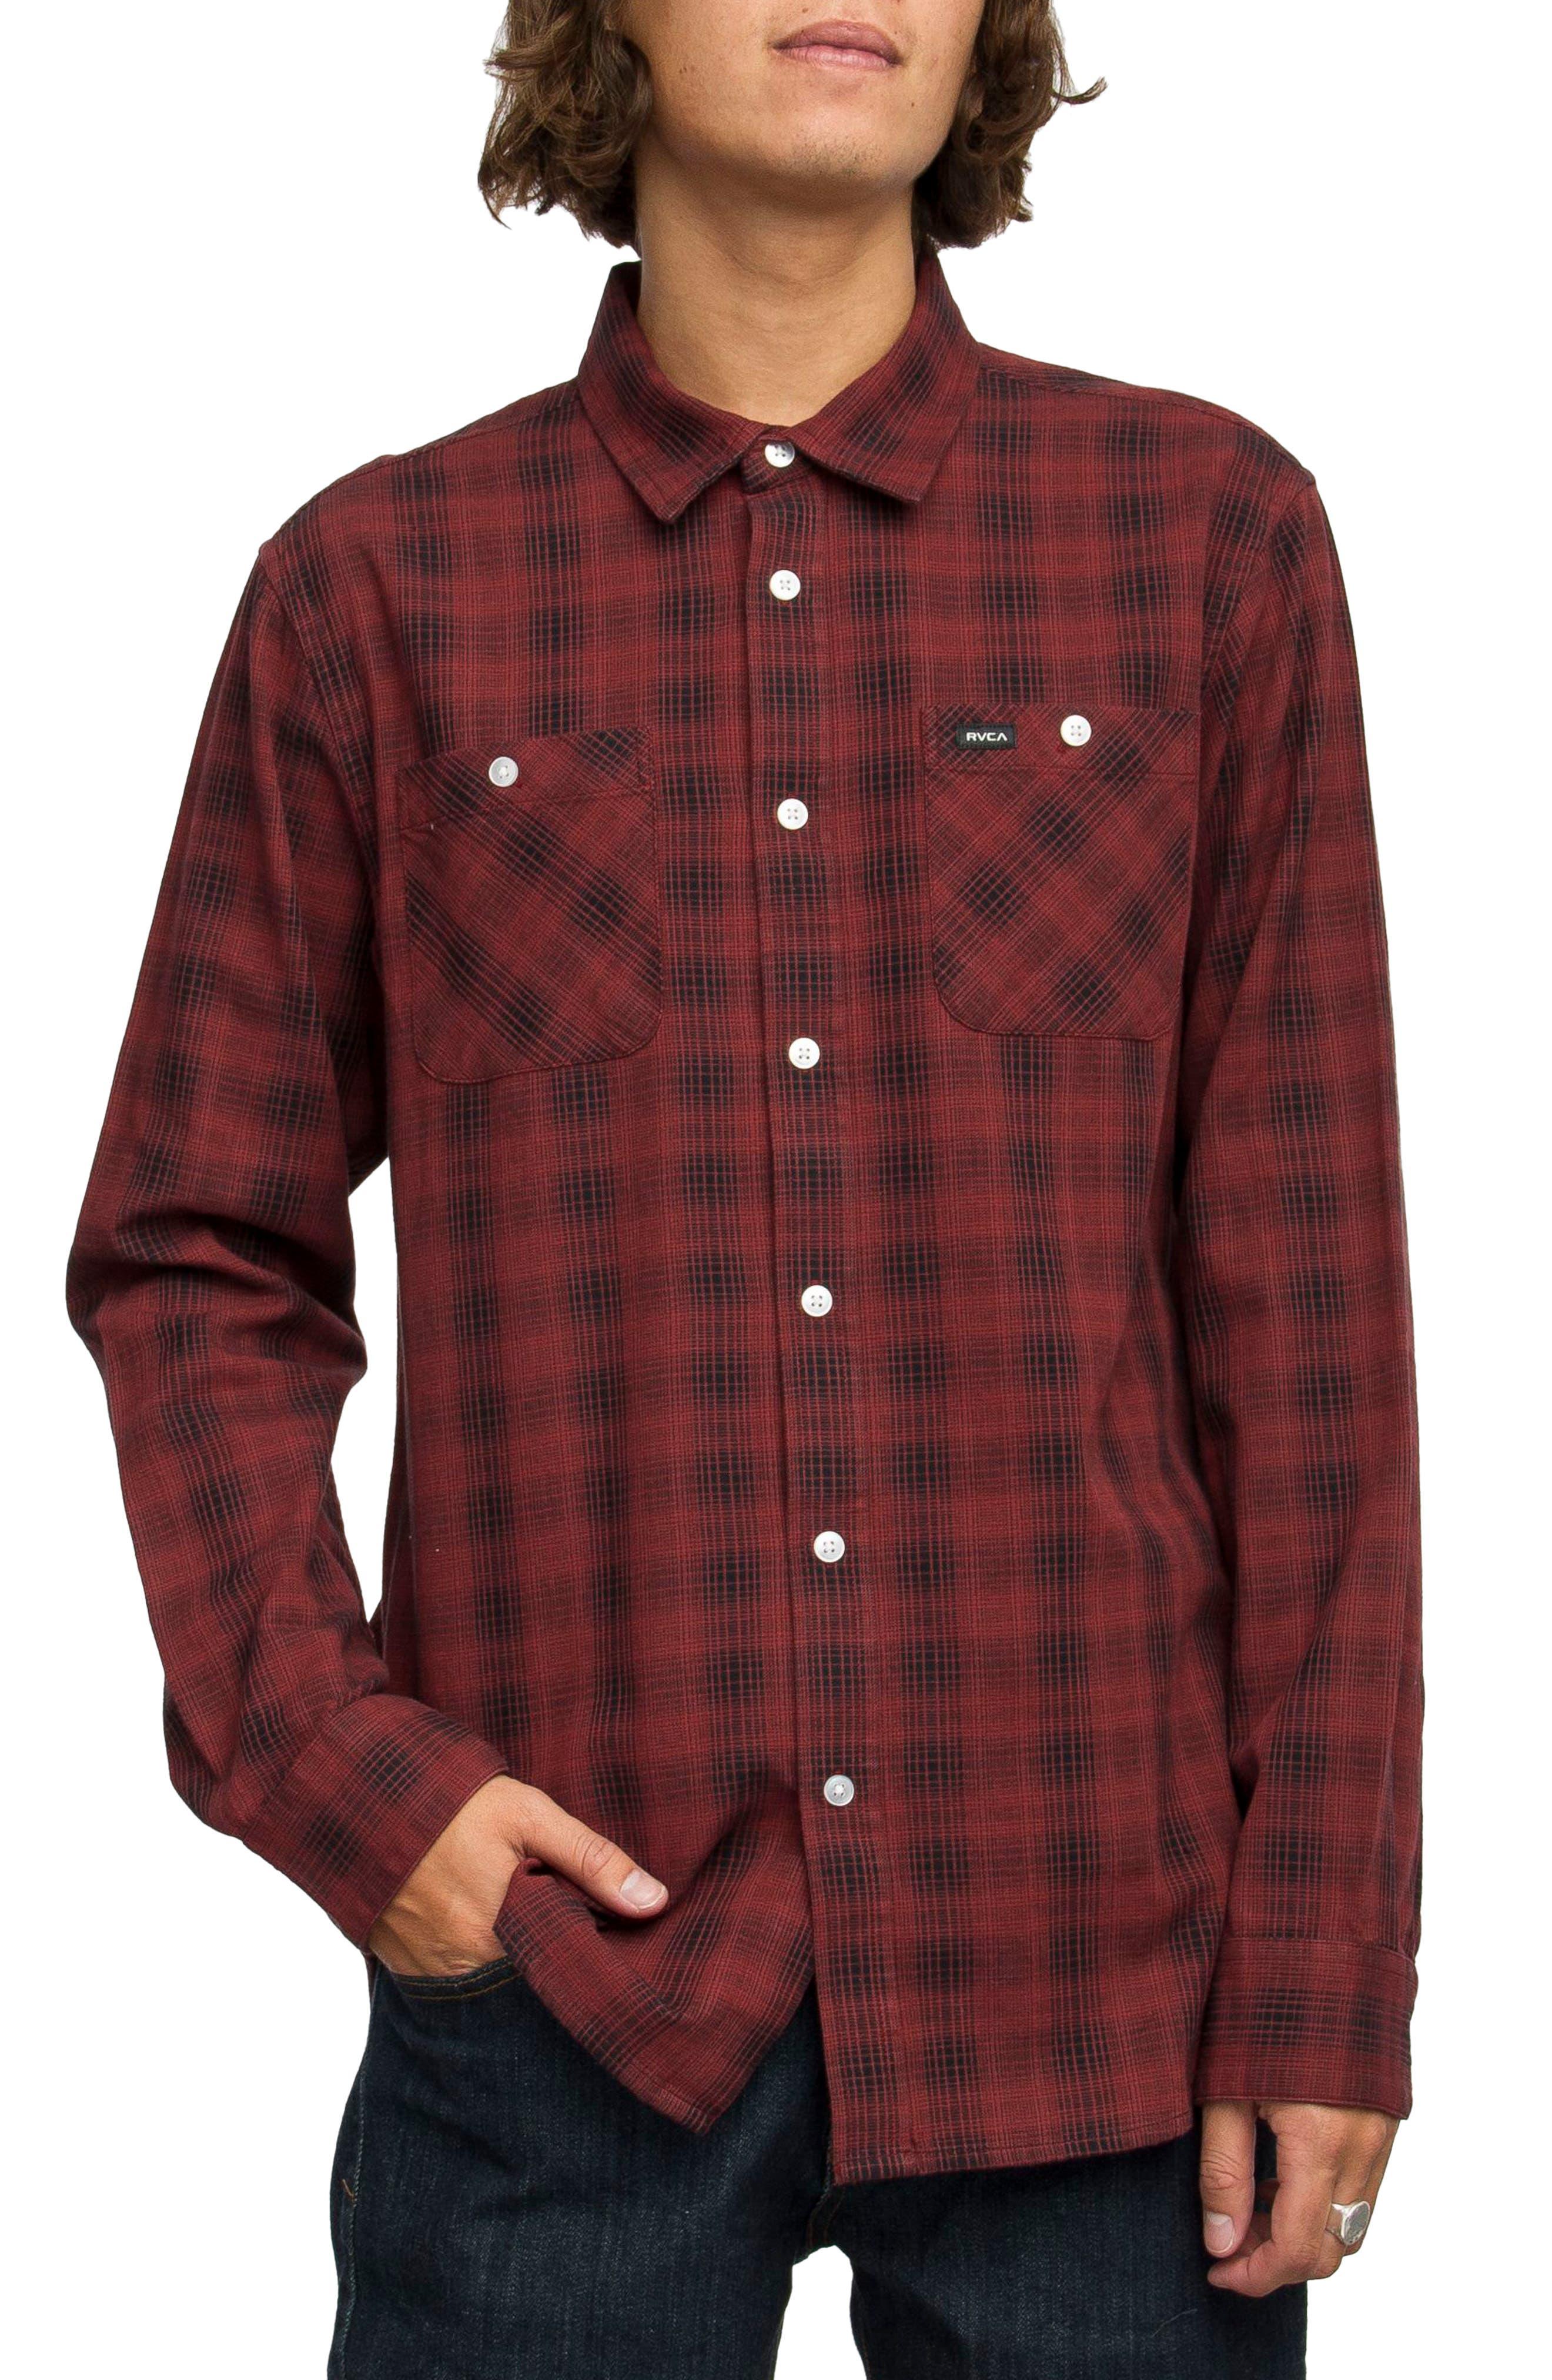 Main Image - RVCA Trample Plaid Flannel Shirt